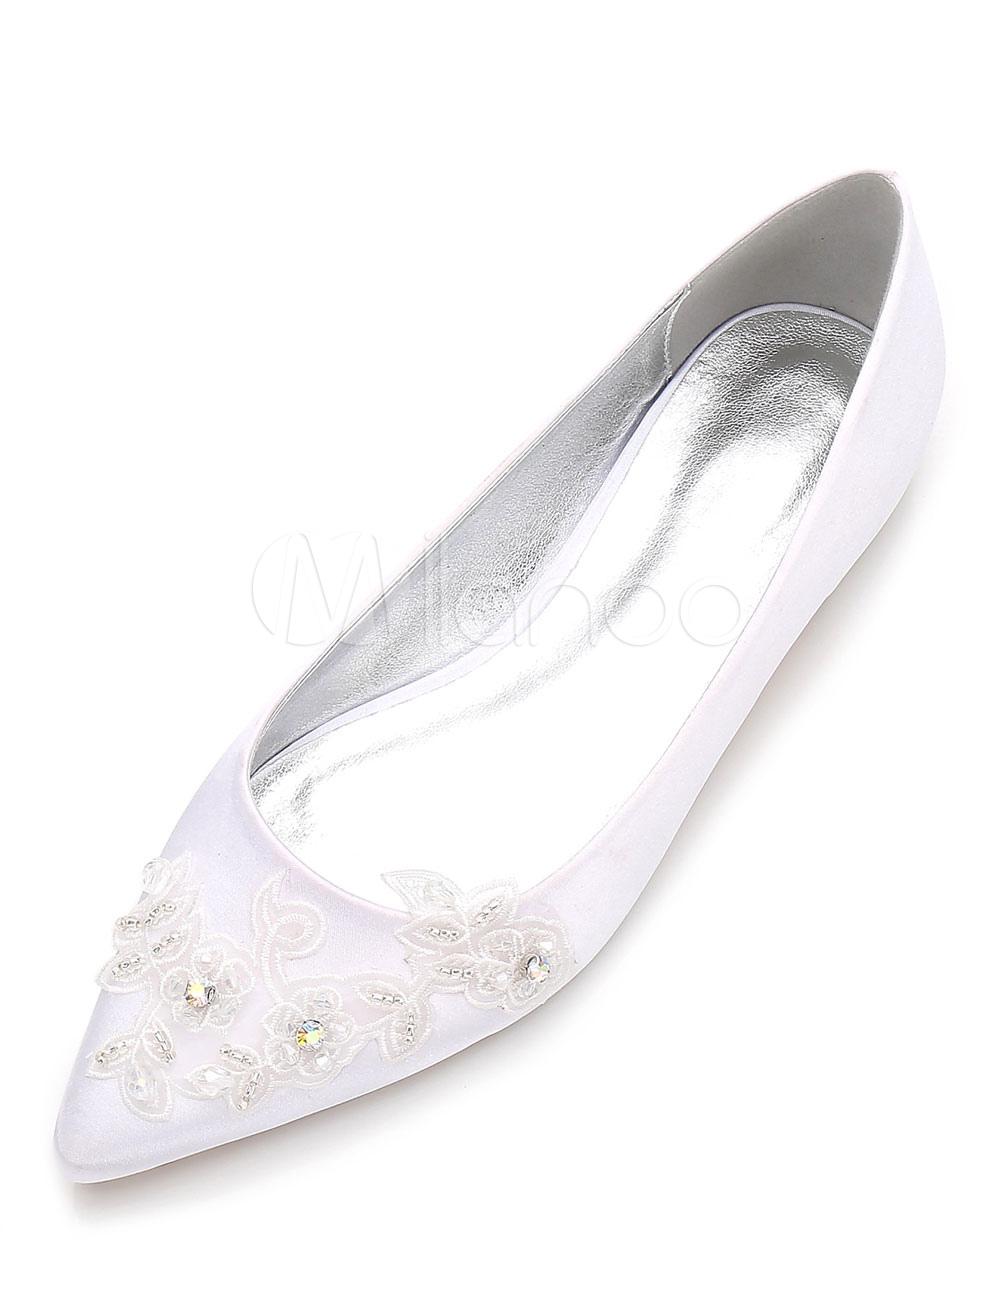 360fa0e13d Ivory Wedding Shoes Satin Rhinestones Flat Bridal Shoes Pointed Toe  Bridesmaid Shoes